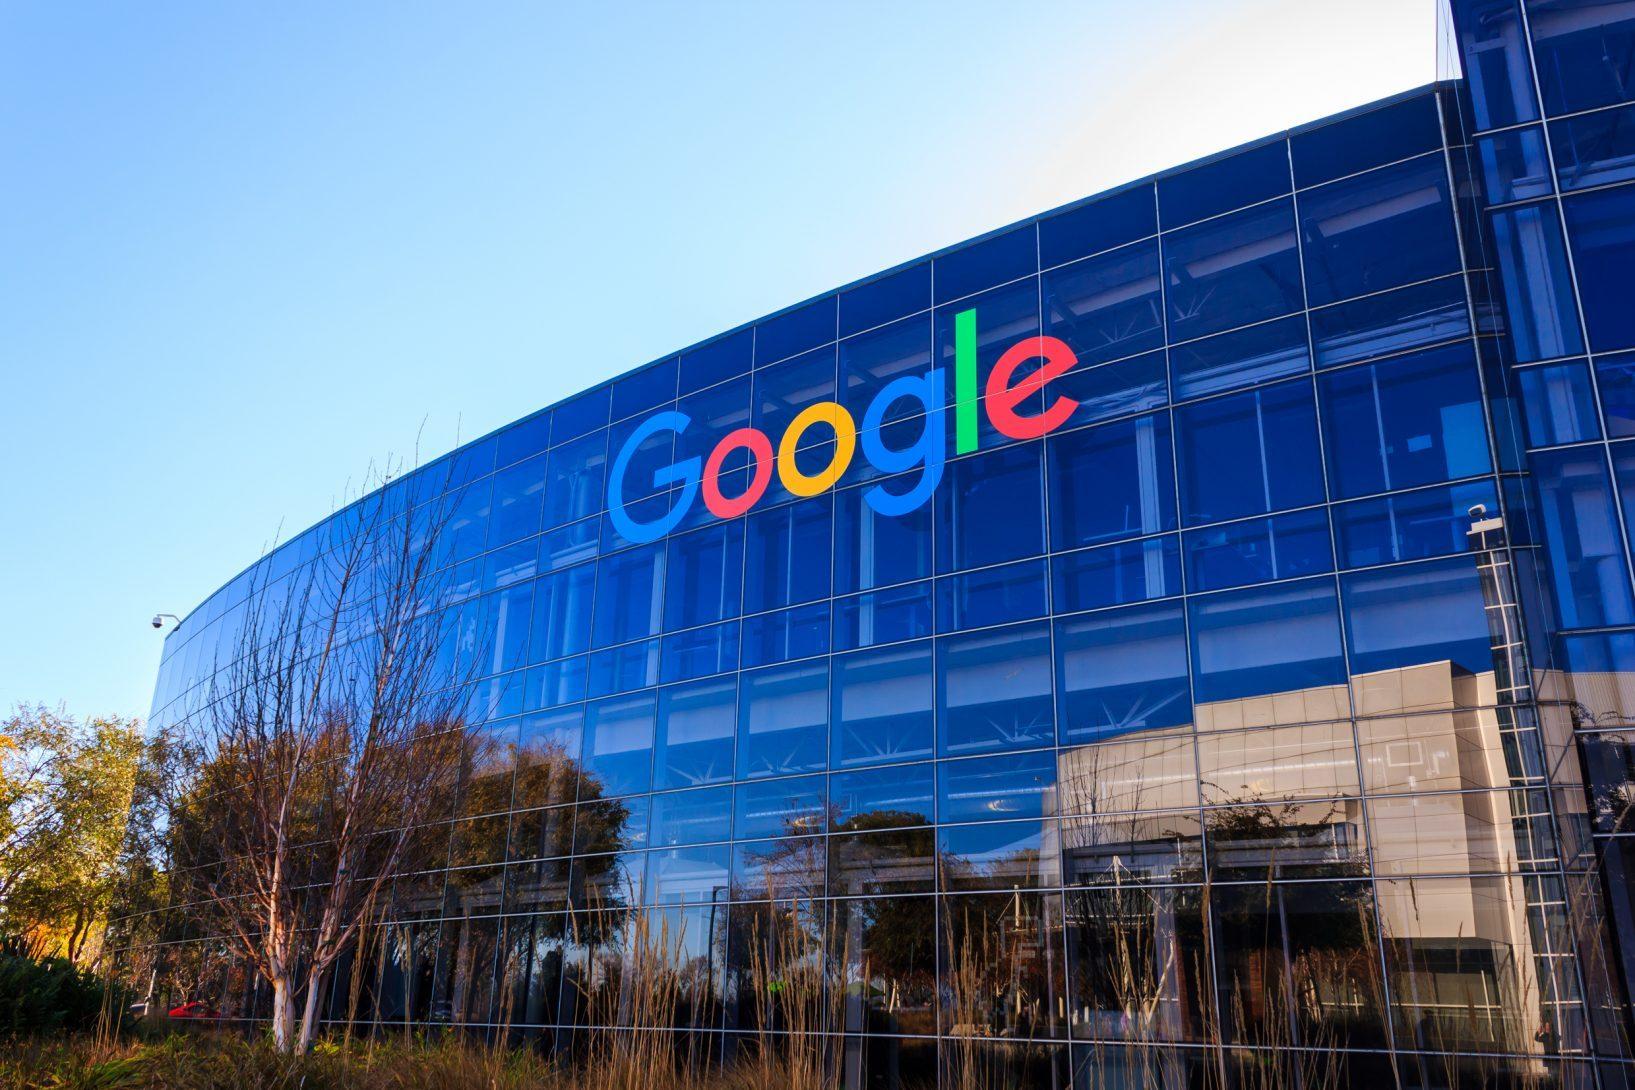 Google Is Shutting Down Its URL Shortening Service, Goo.gl